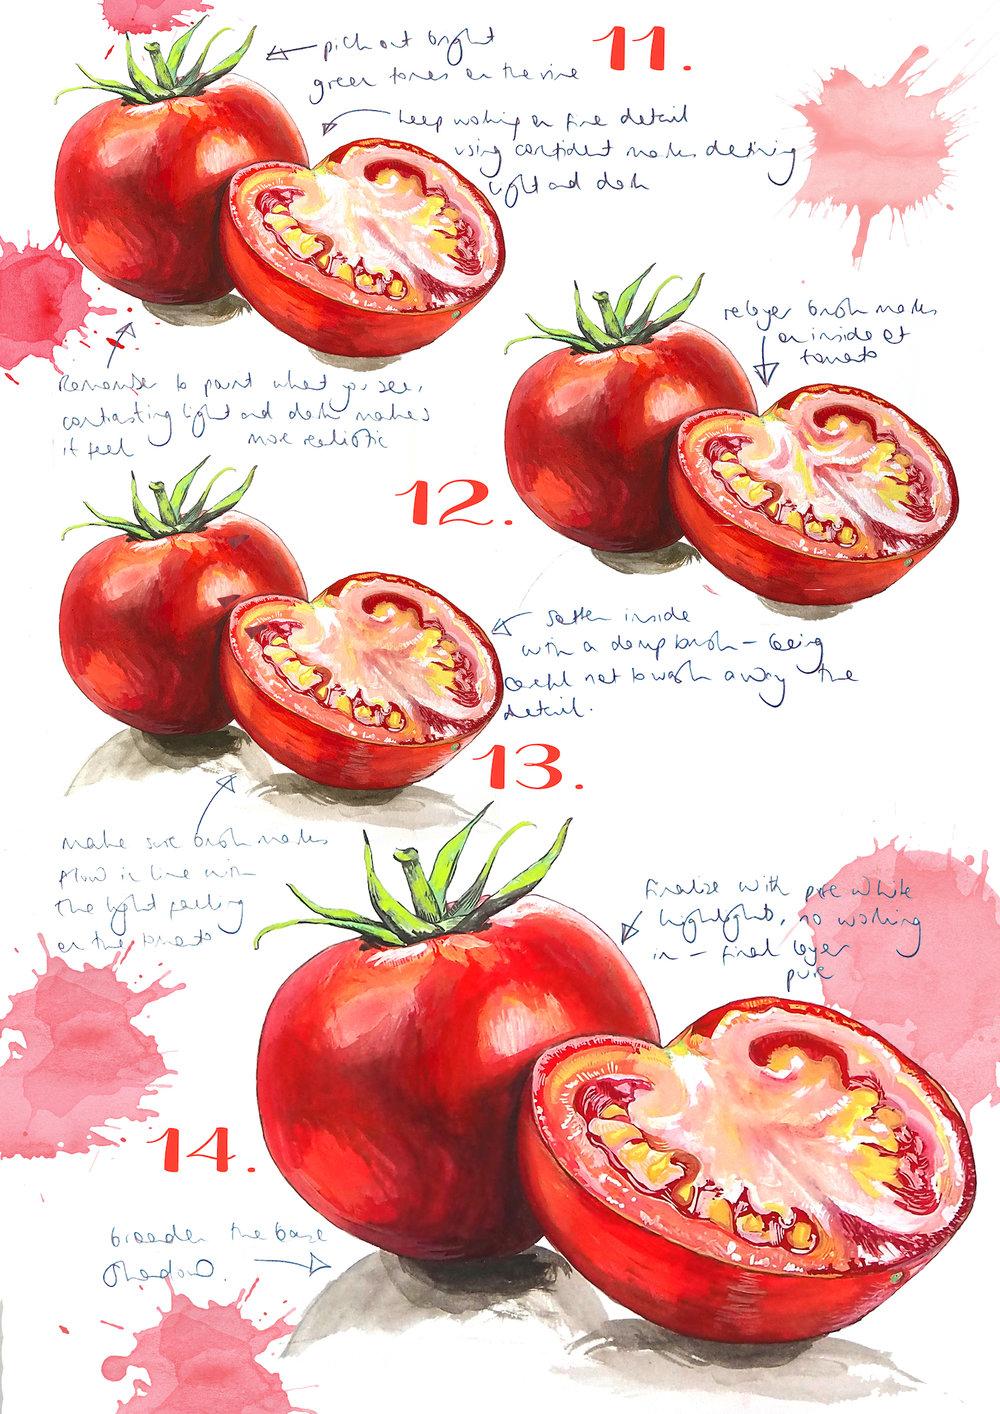 Tomatoes 3.jpg